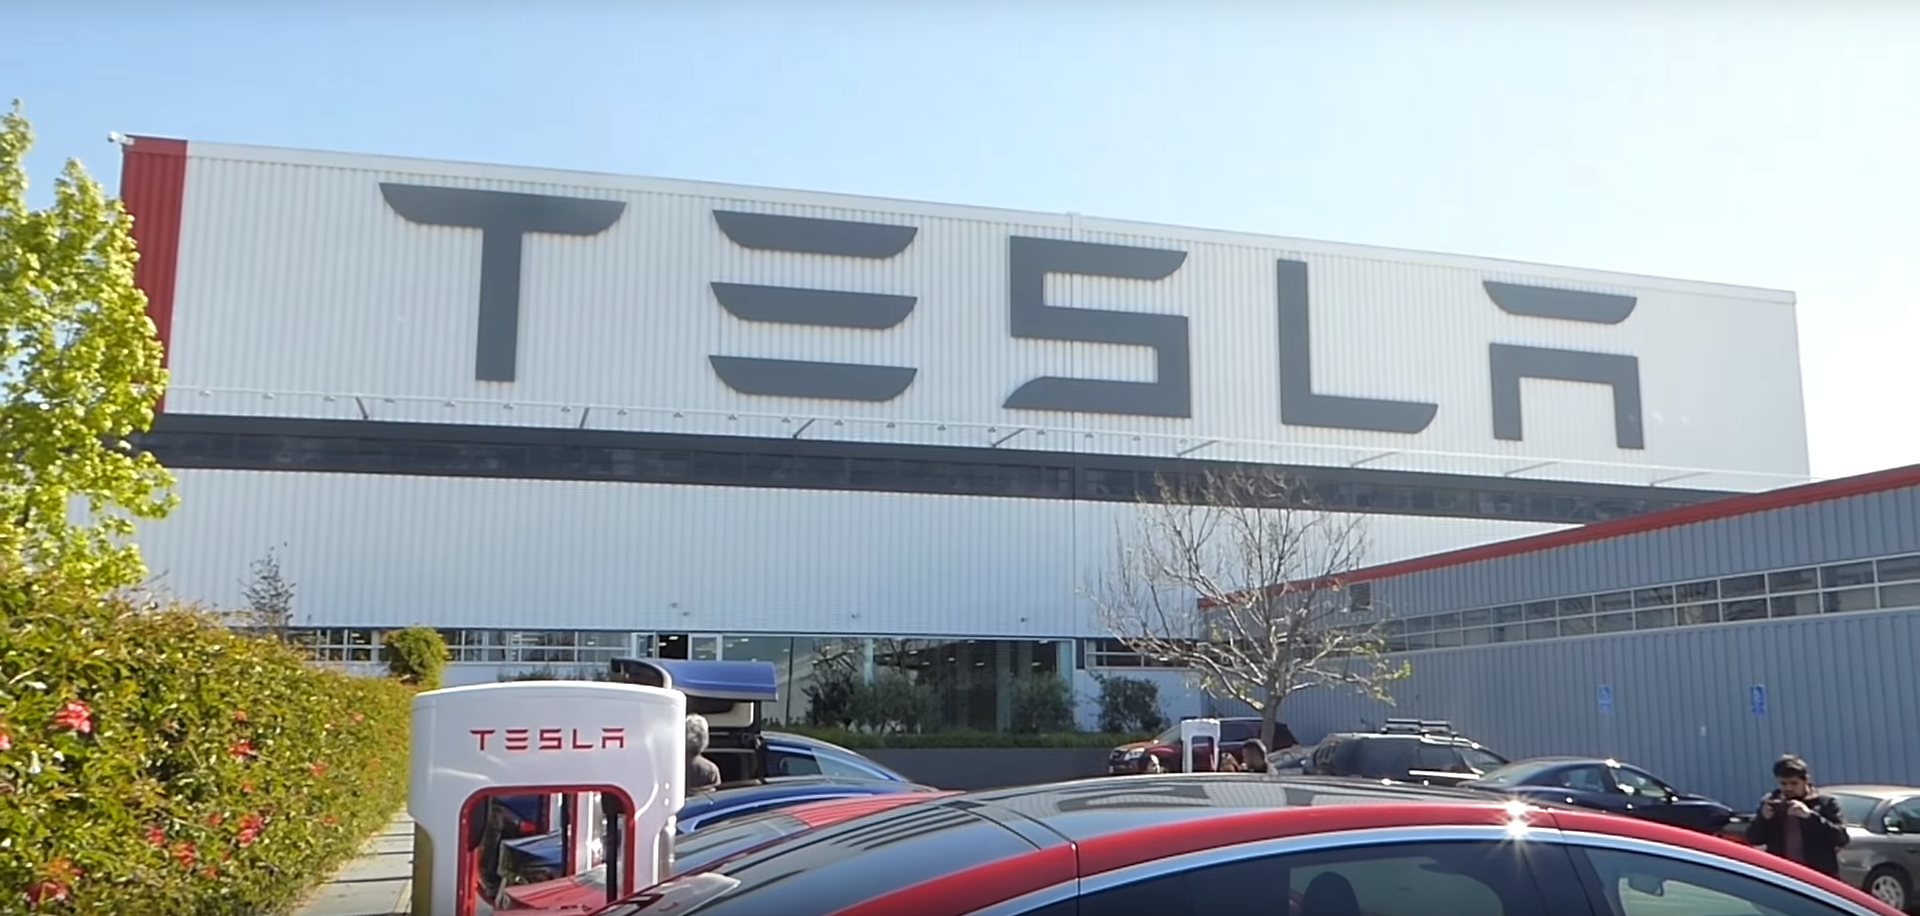 Elon Musk: Tesla will move from California to Texas/Nevada due to local coronavirus response